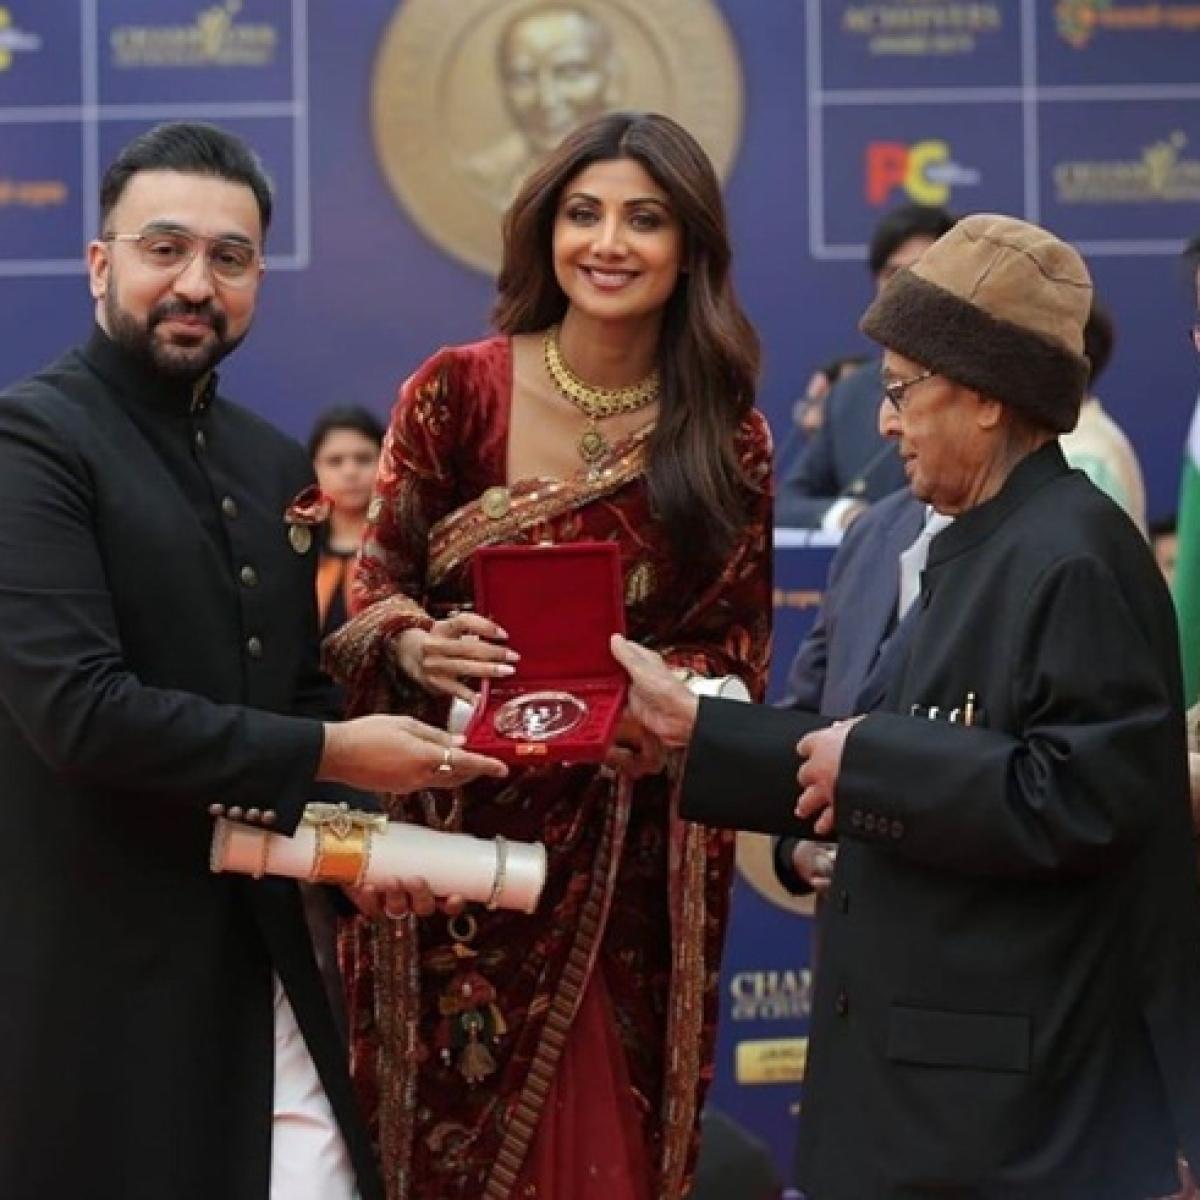 NRI accuses Shilpa Shetty's hubby Raj Kundra of cheating in 'gold scam'